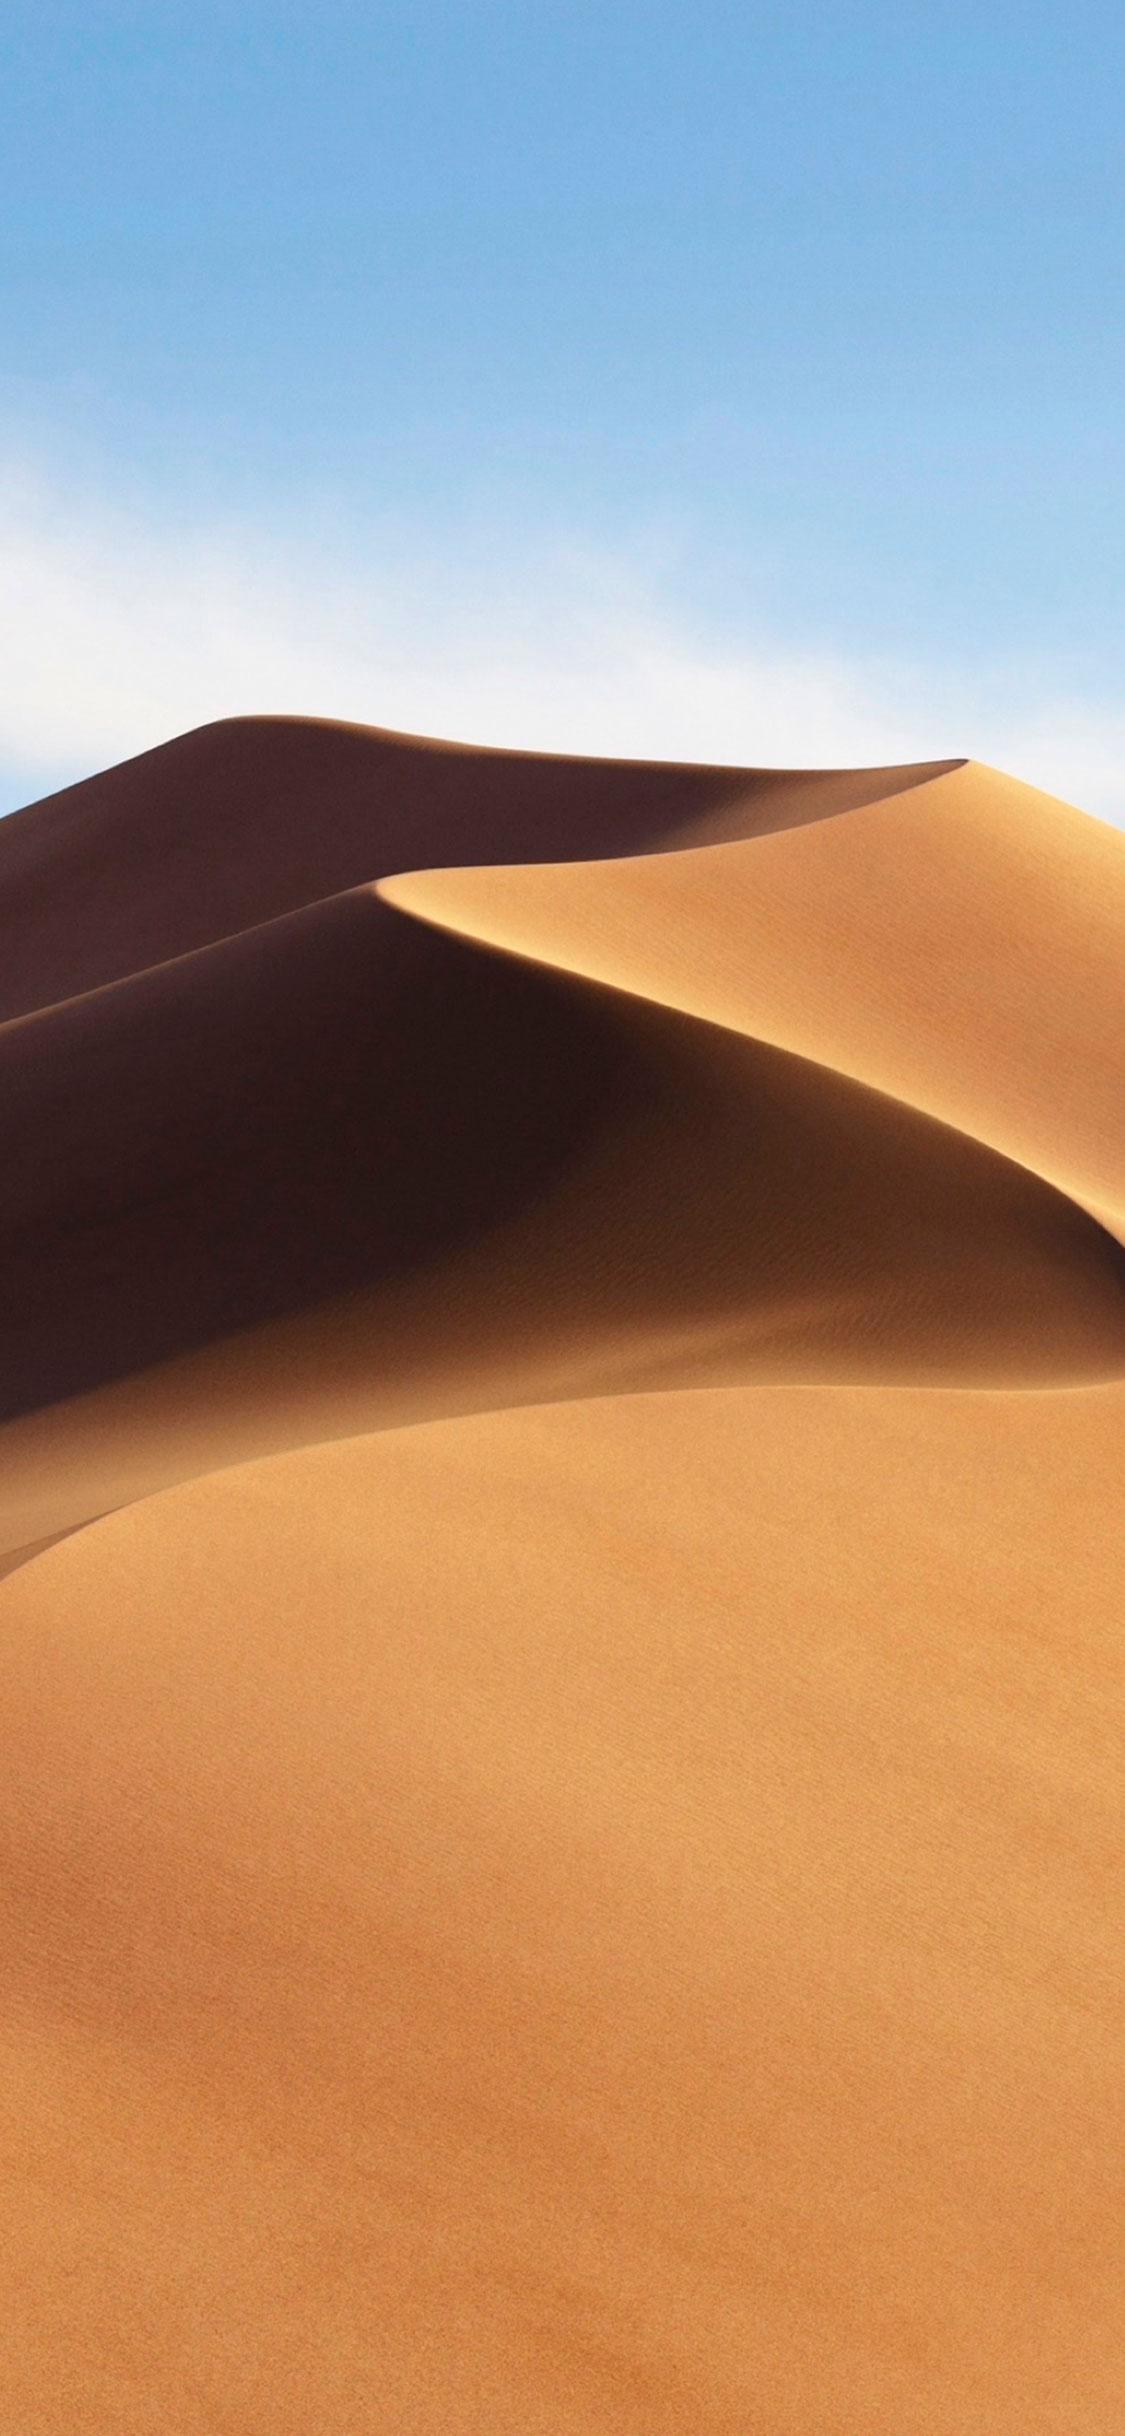 iPhone wallpaper macos mojave3 macOS Mojave